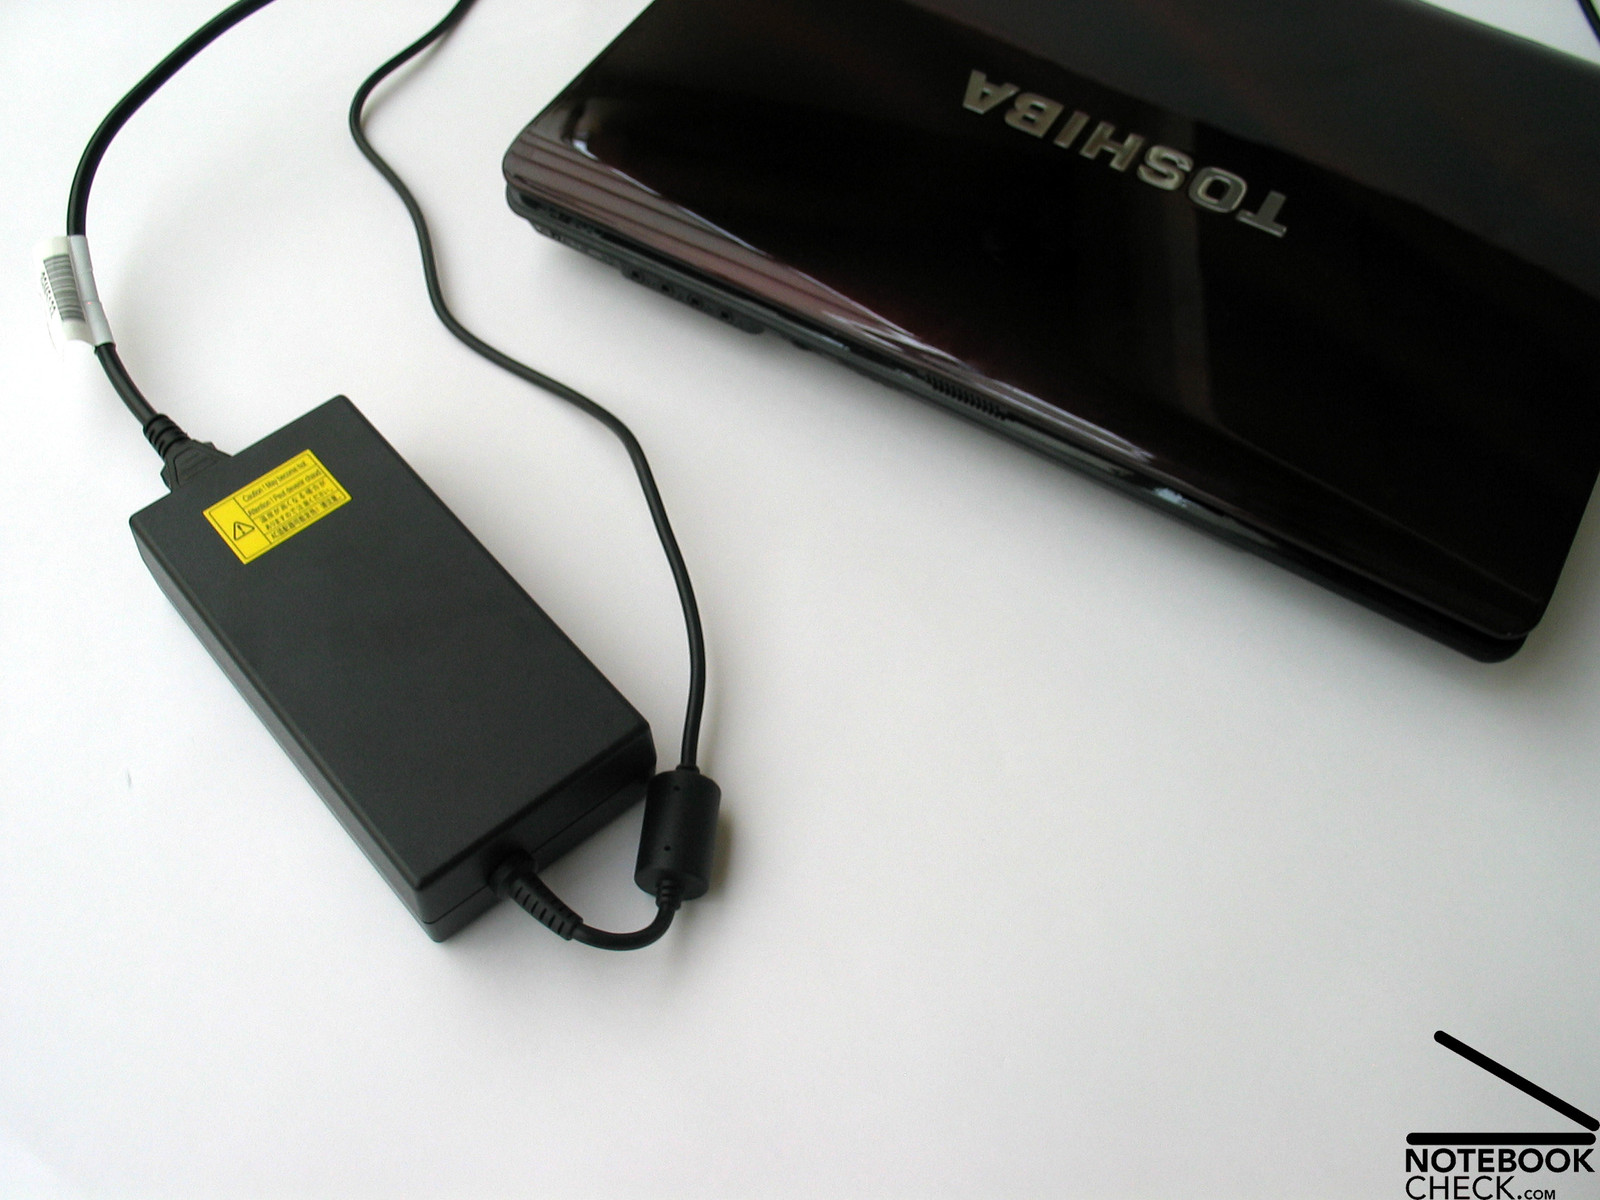 Testrapport Toshiba Satego X200 Notebook - Notebookcheck.nl